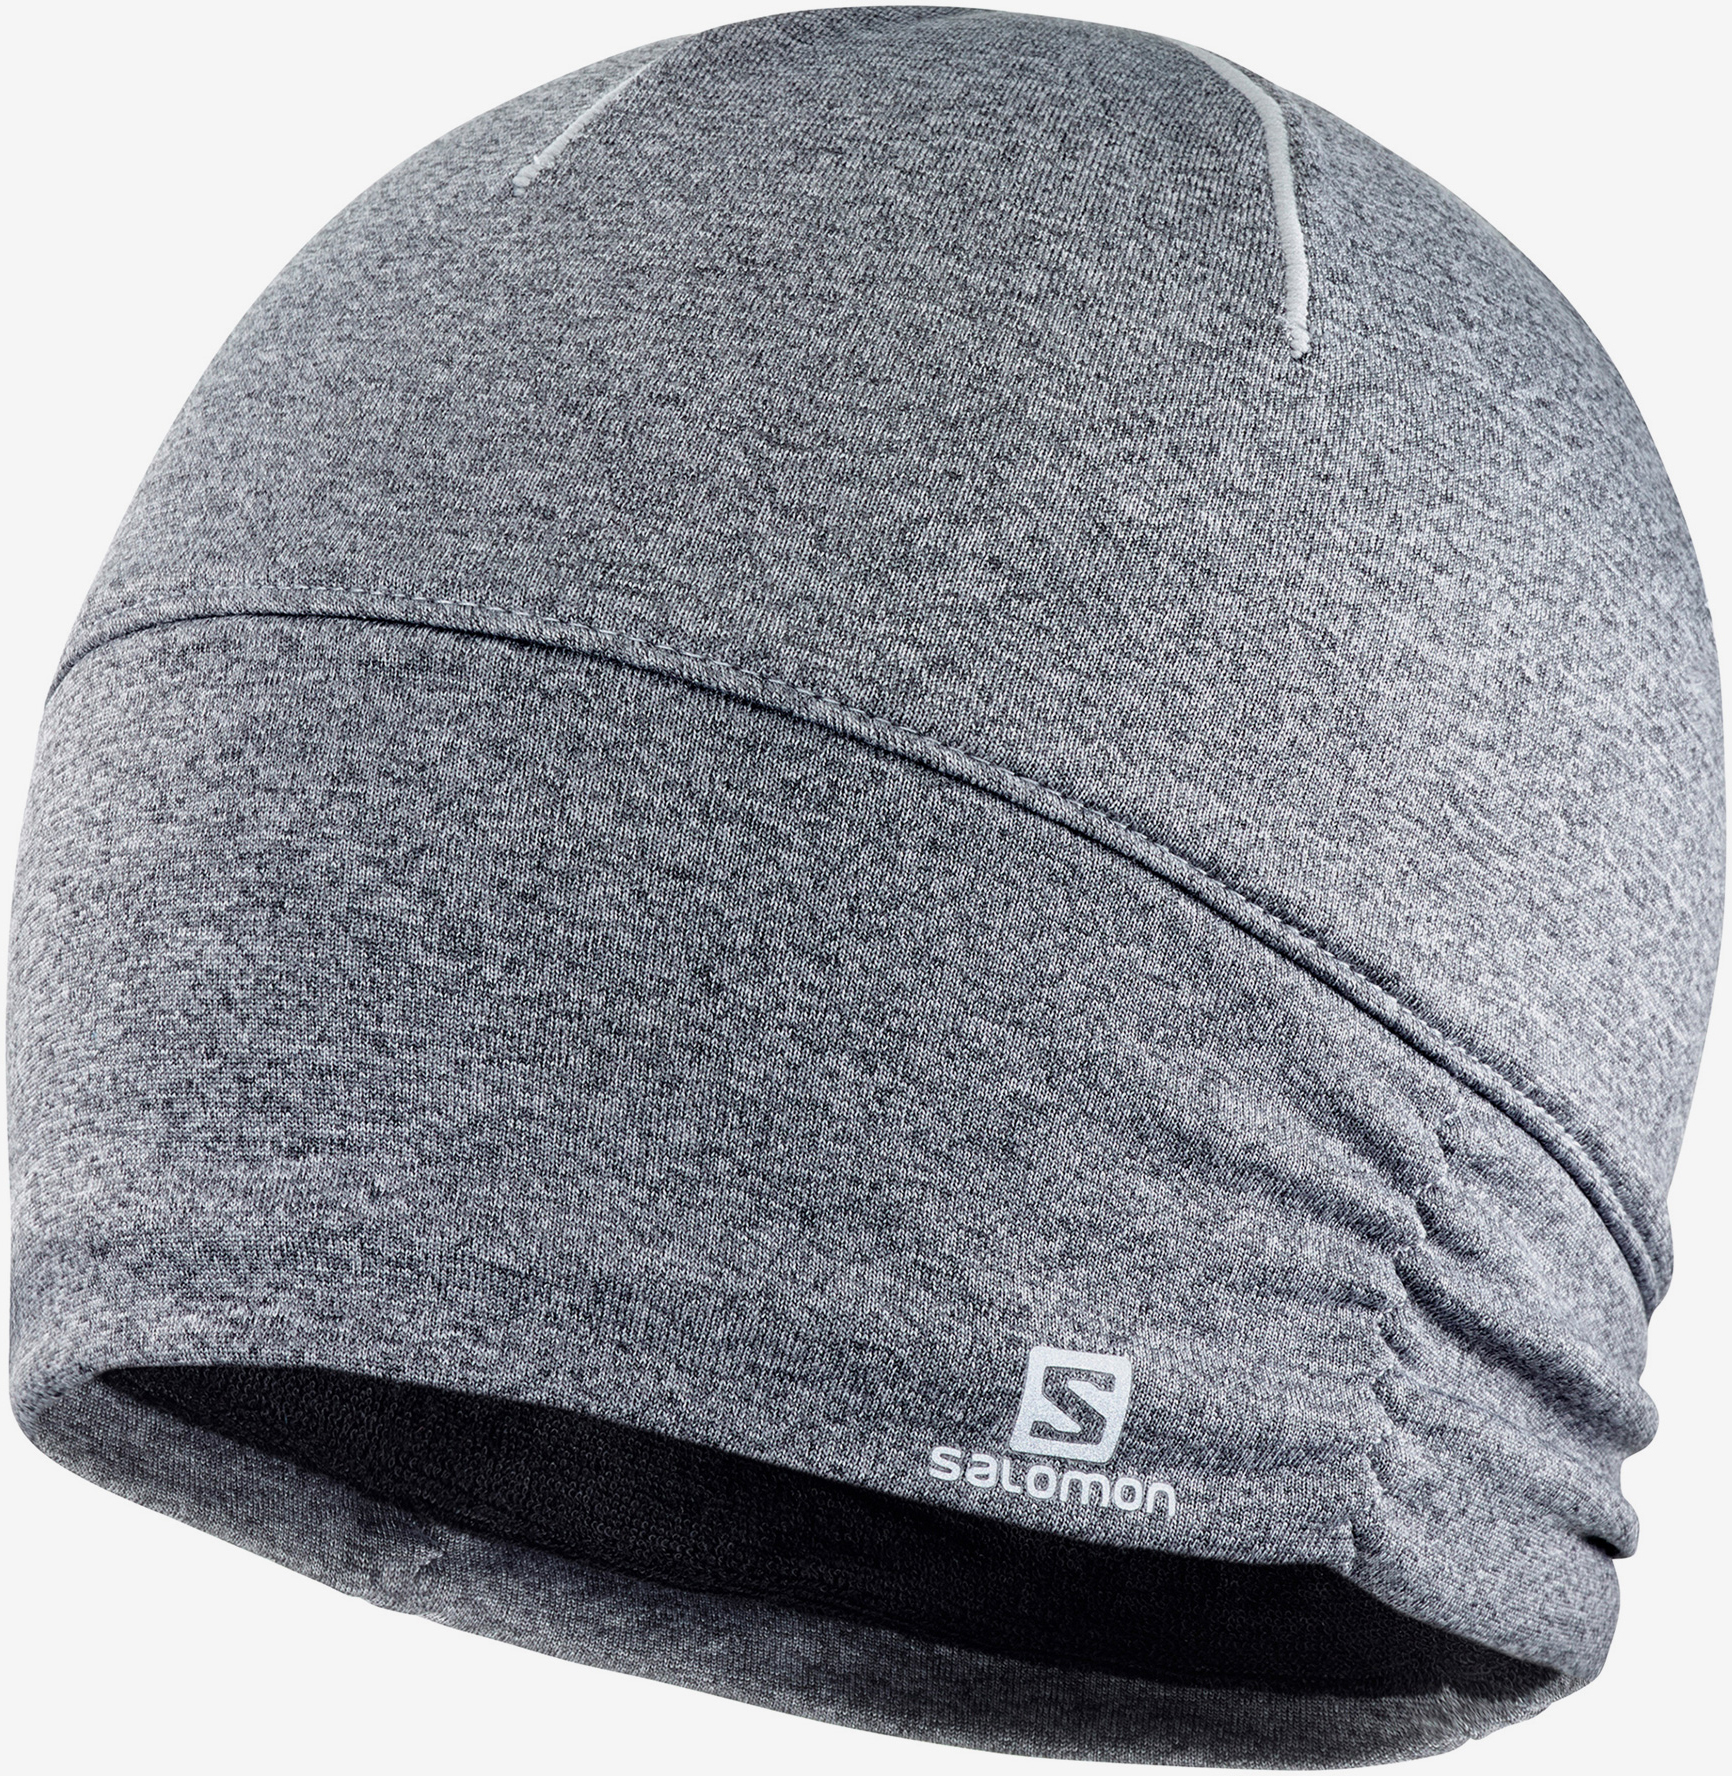 Спортивные шапки Шапка Salomon Elevate Warm Beanie W Alloy Heat elevate-warm-beanie-w__LC1179000.jpg